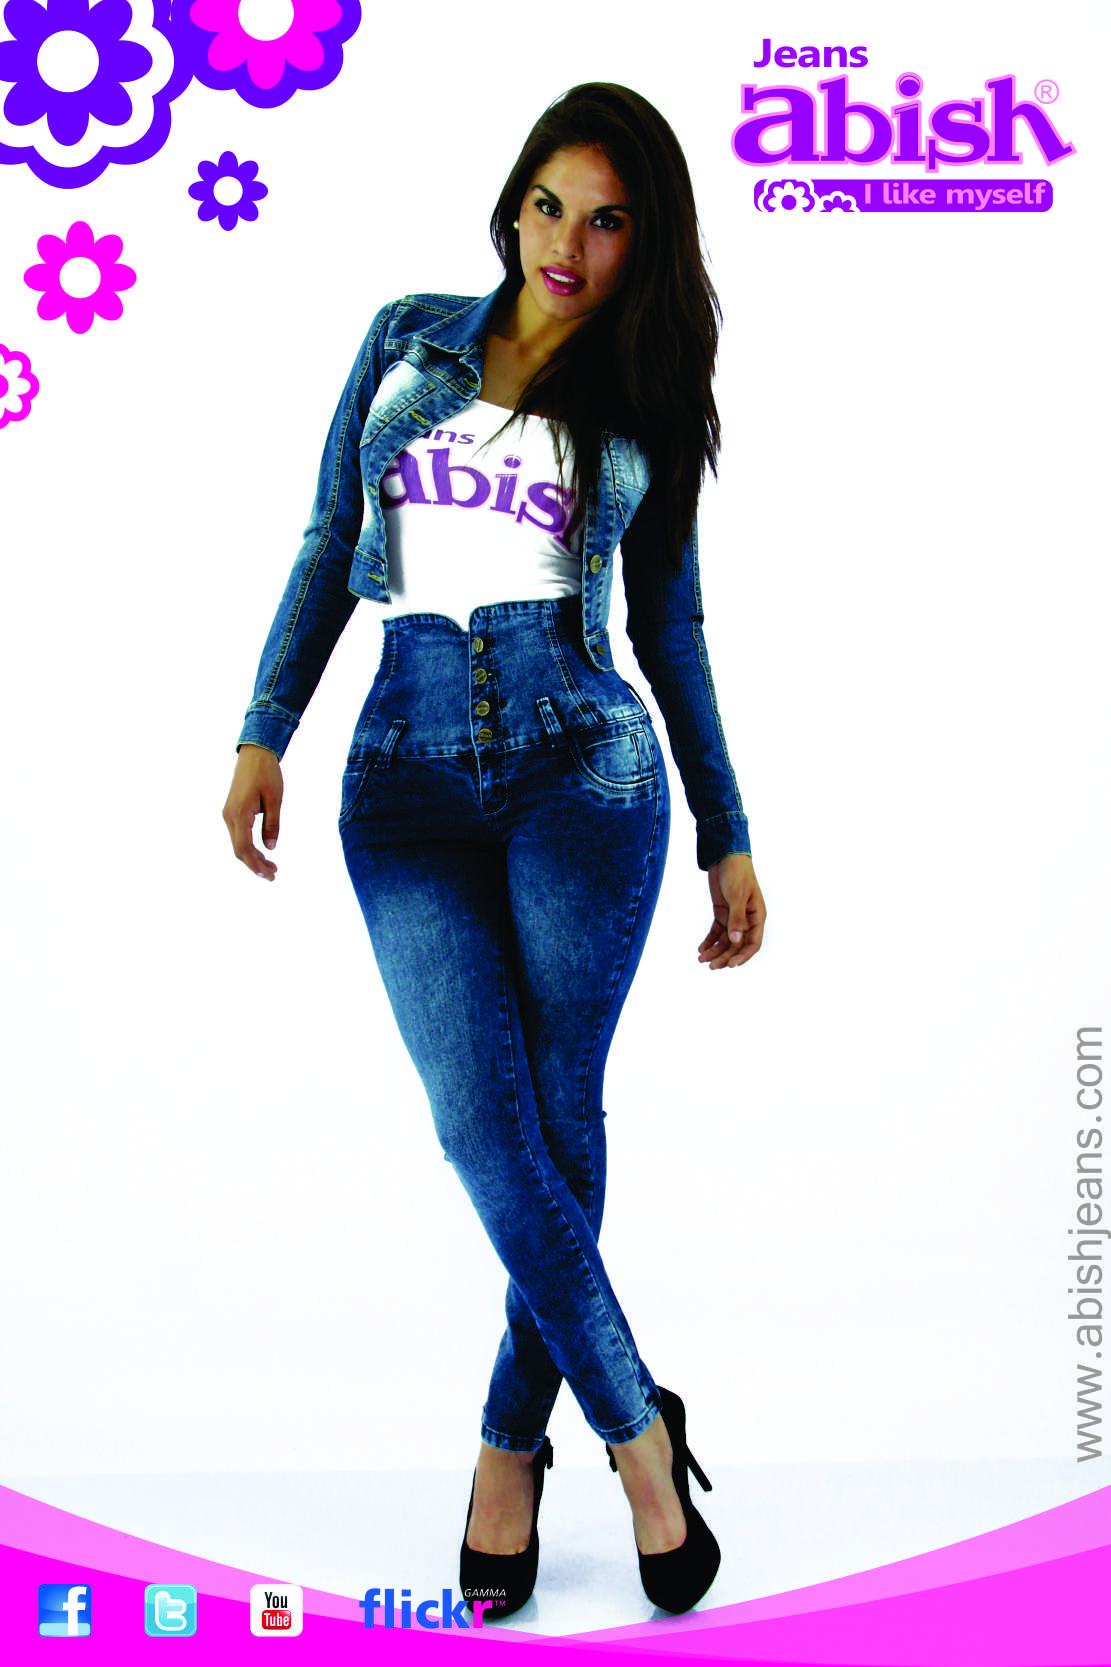 Pantalones Faja Abish Jeans En Gamarra 0a152f30c53e5294 Jpg Galerias Gamarra Ropa En Peru